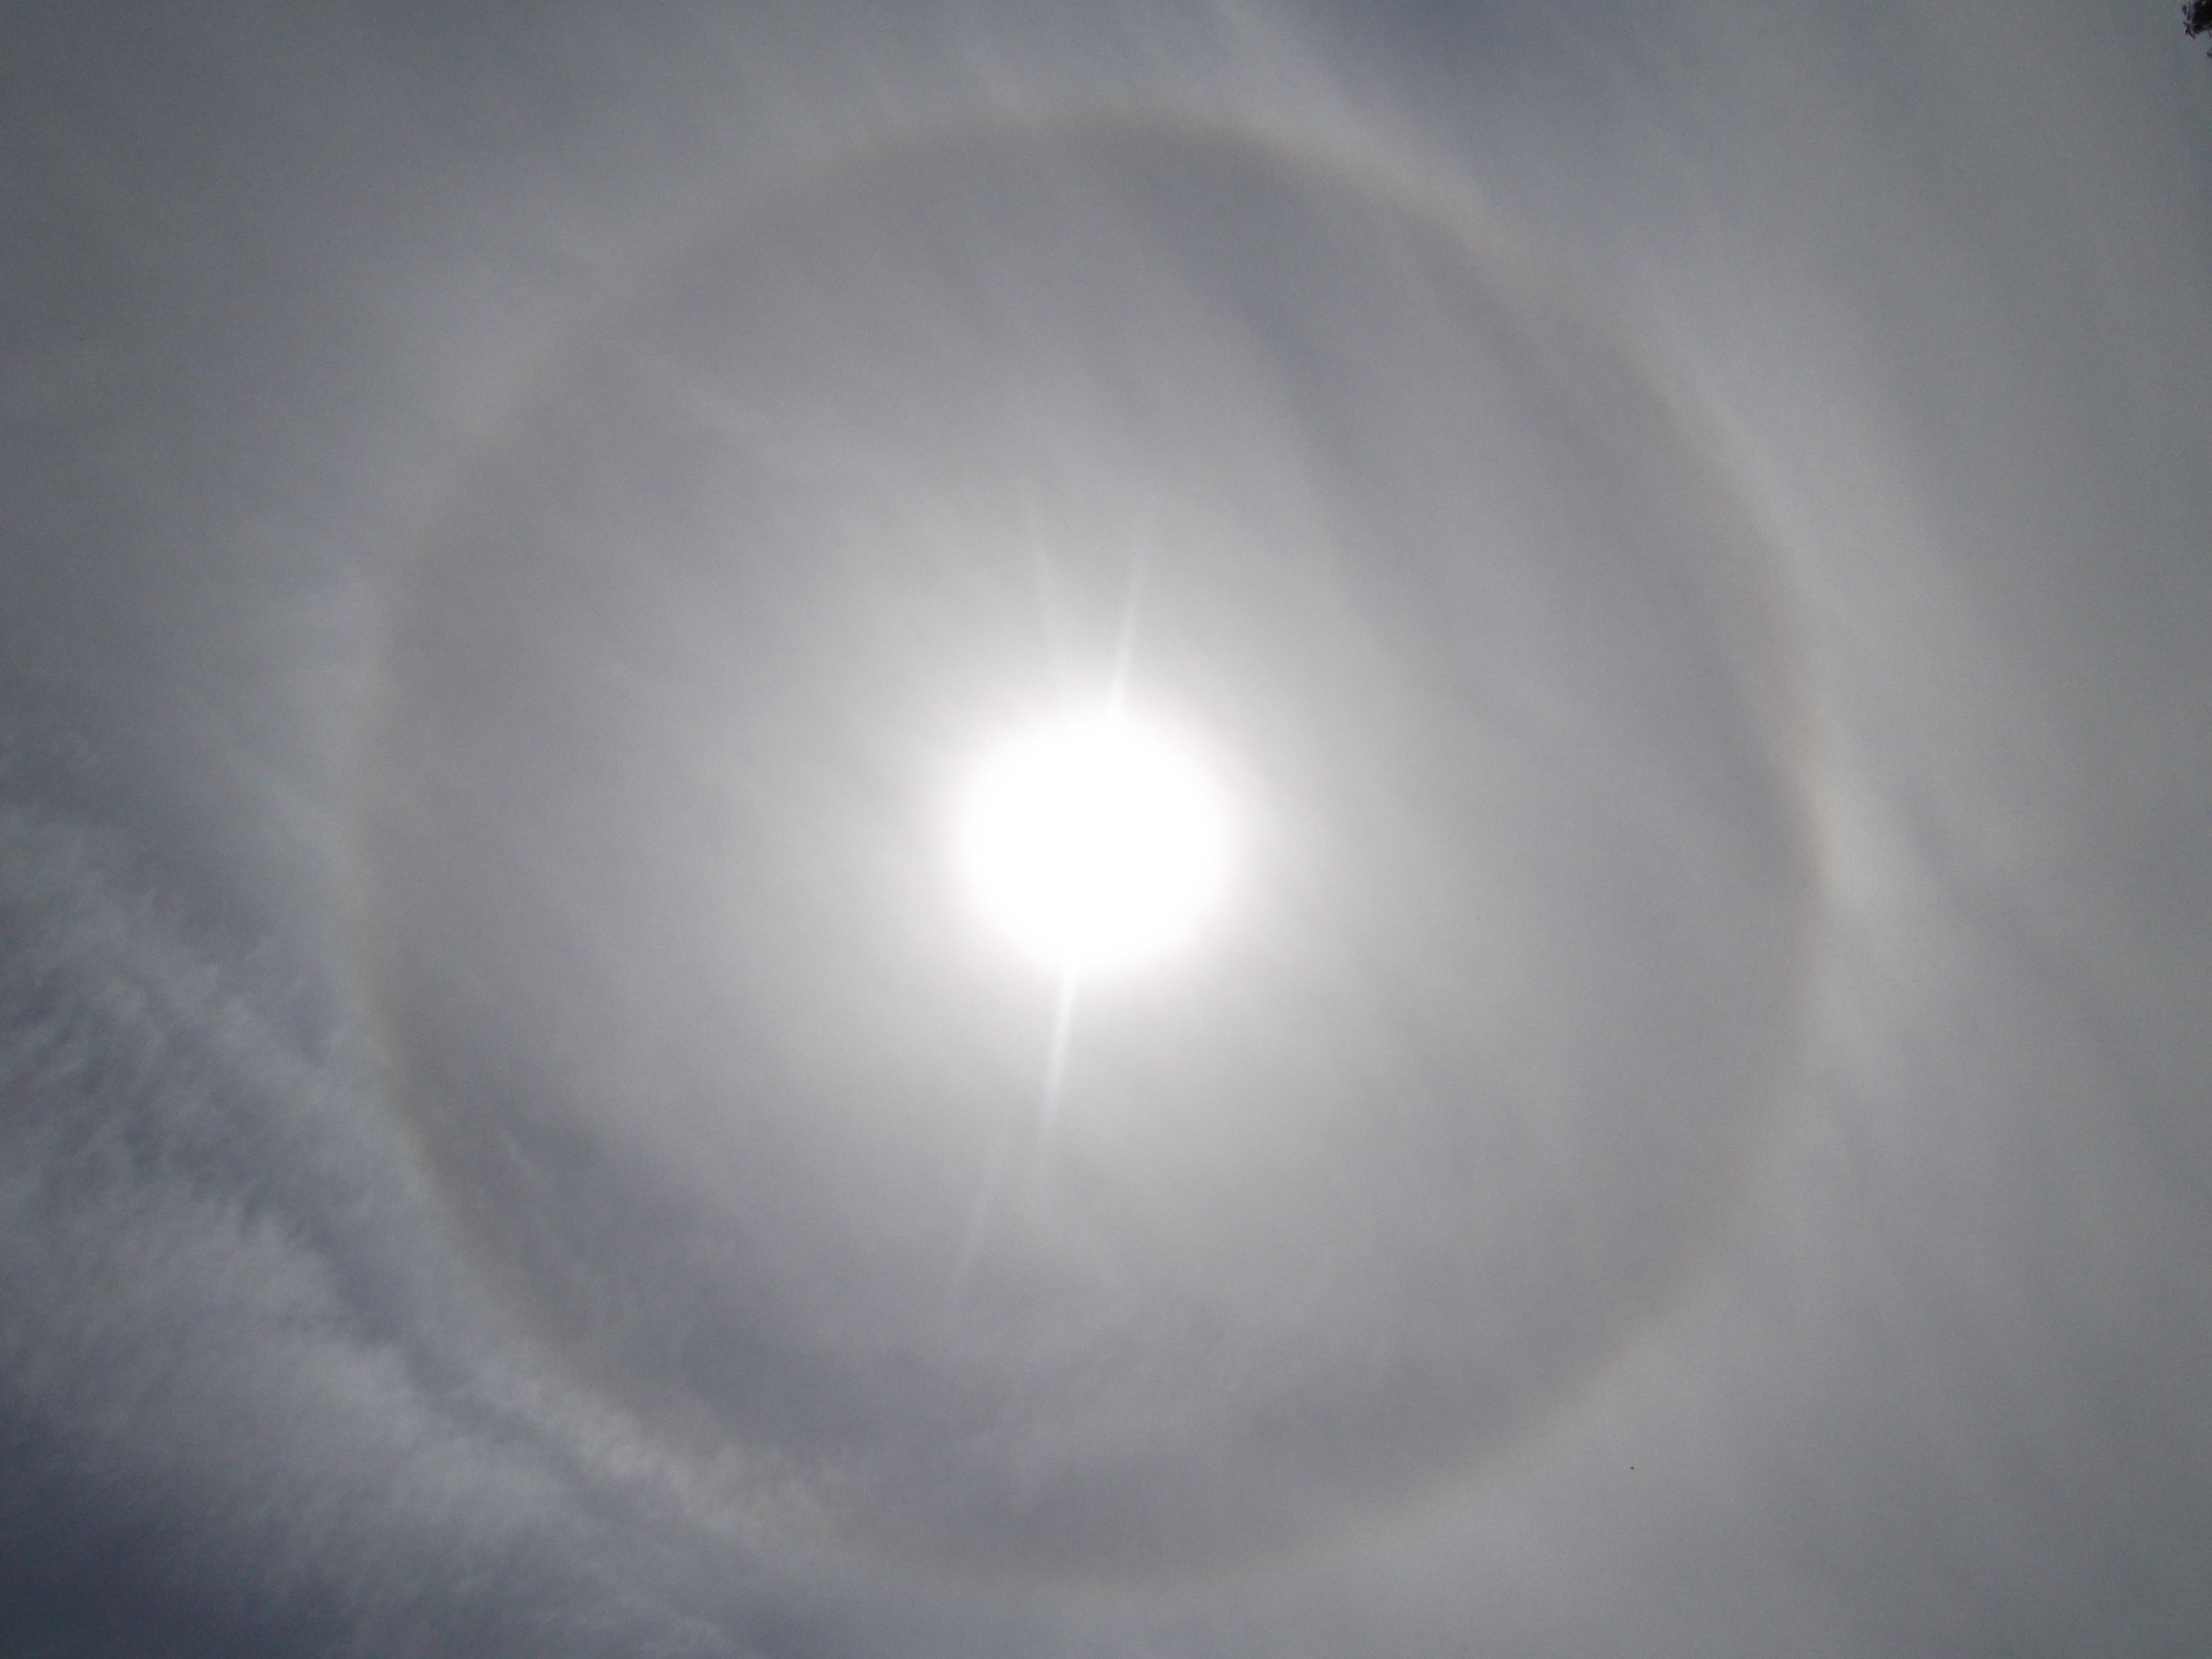 Light Cloud Sky Sun Sunlight Atmosphere Refraction Reflection Moon Circle Eiskristalle Effect Astronomical Object